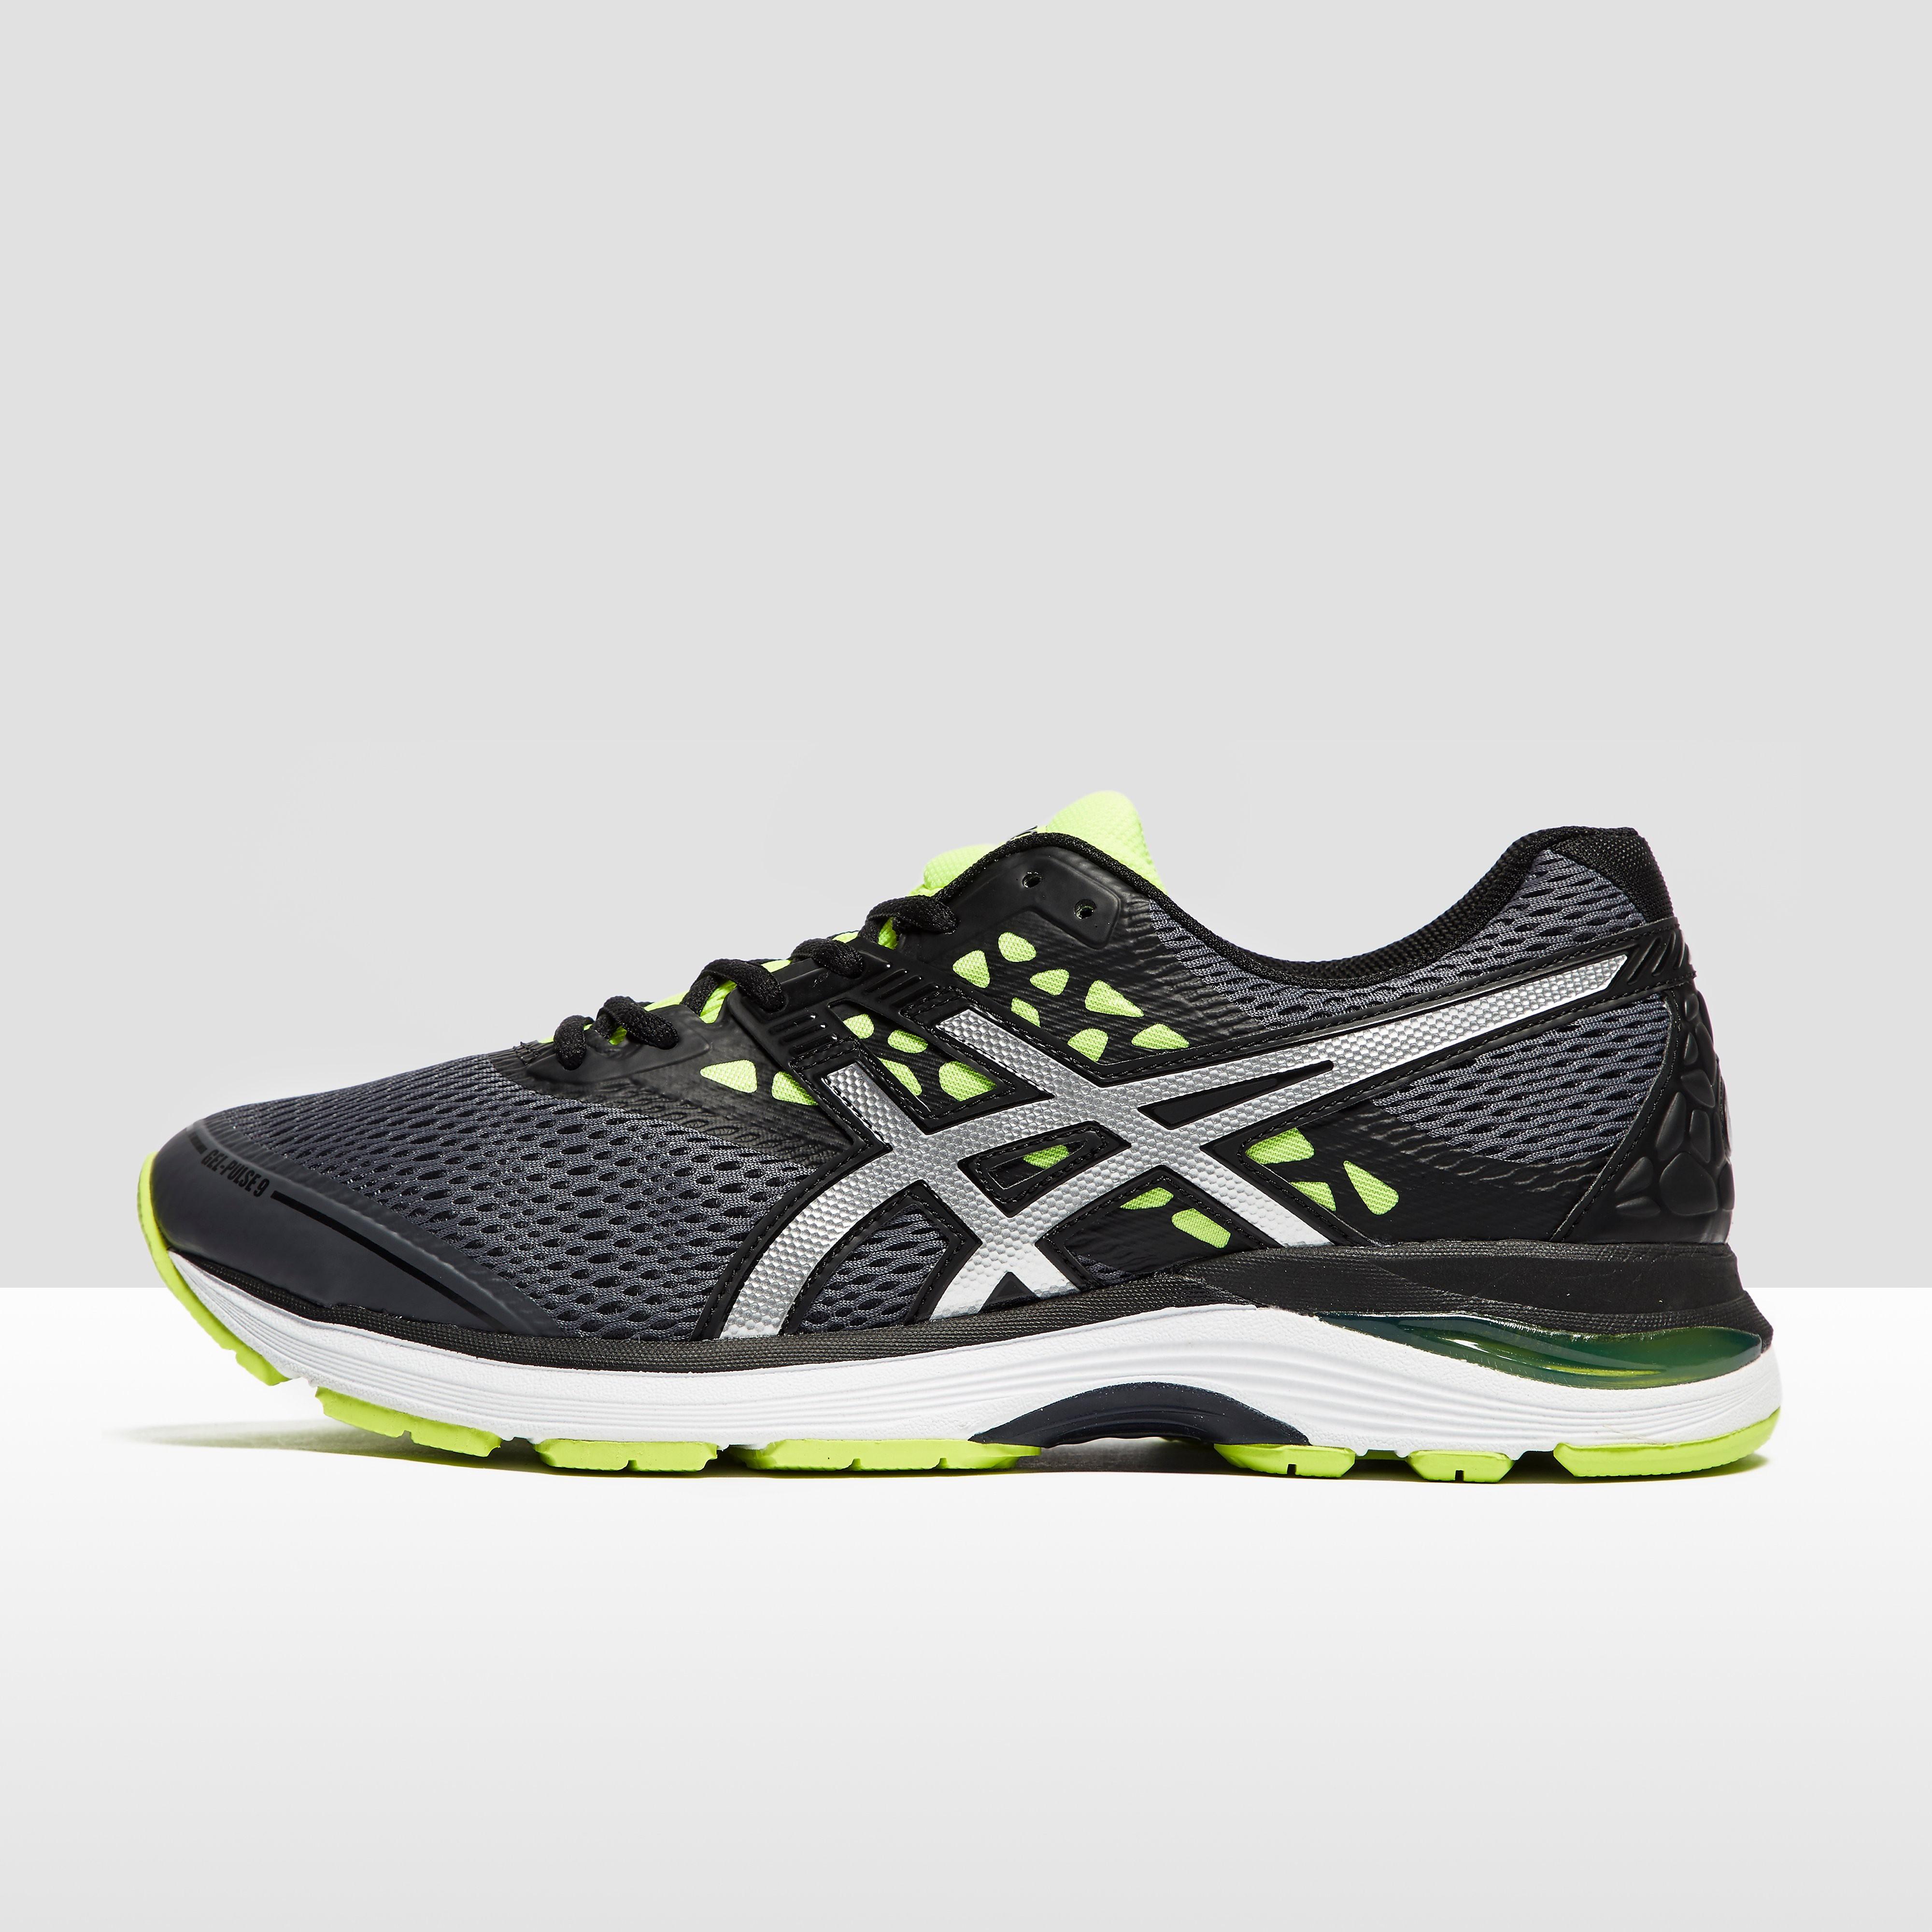 ASICS GEL-PULSE 9 Men's Running Shoes